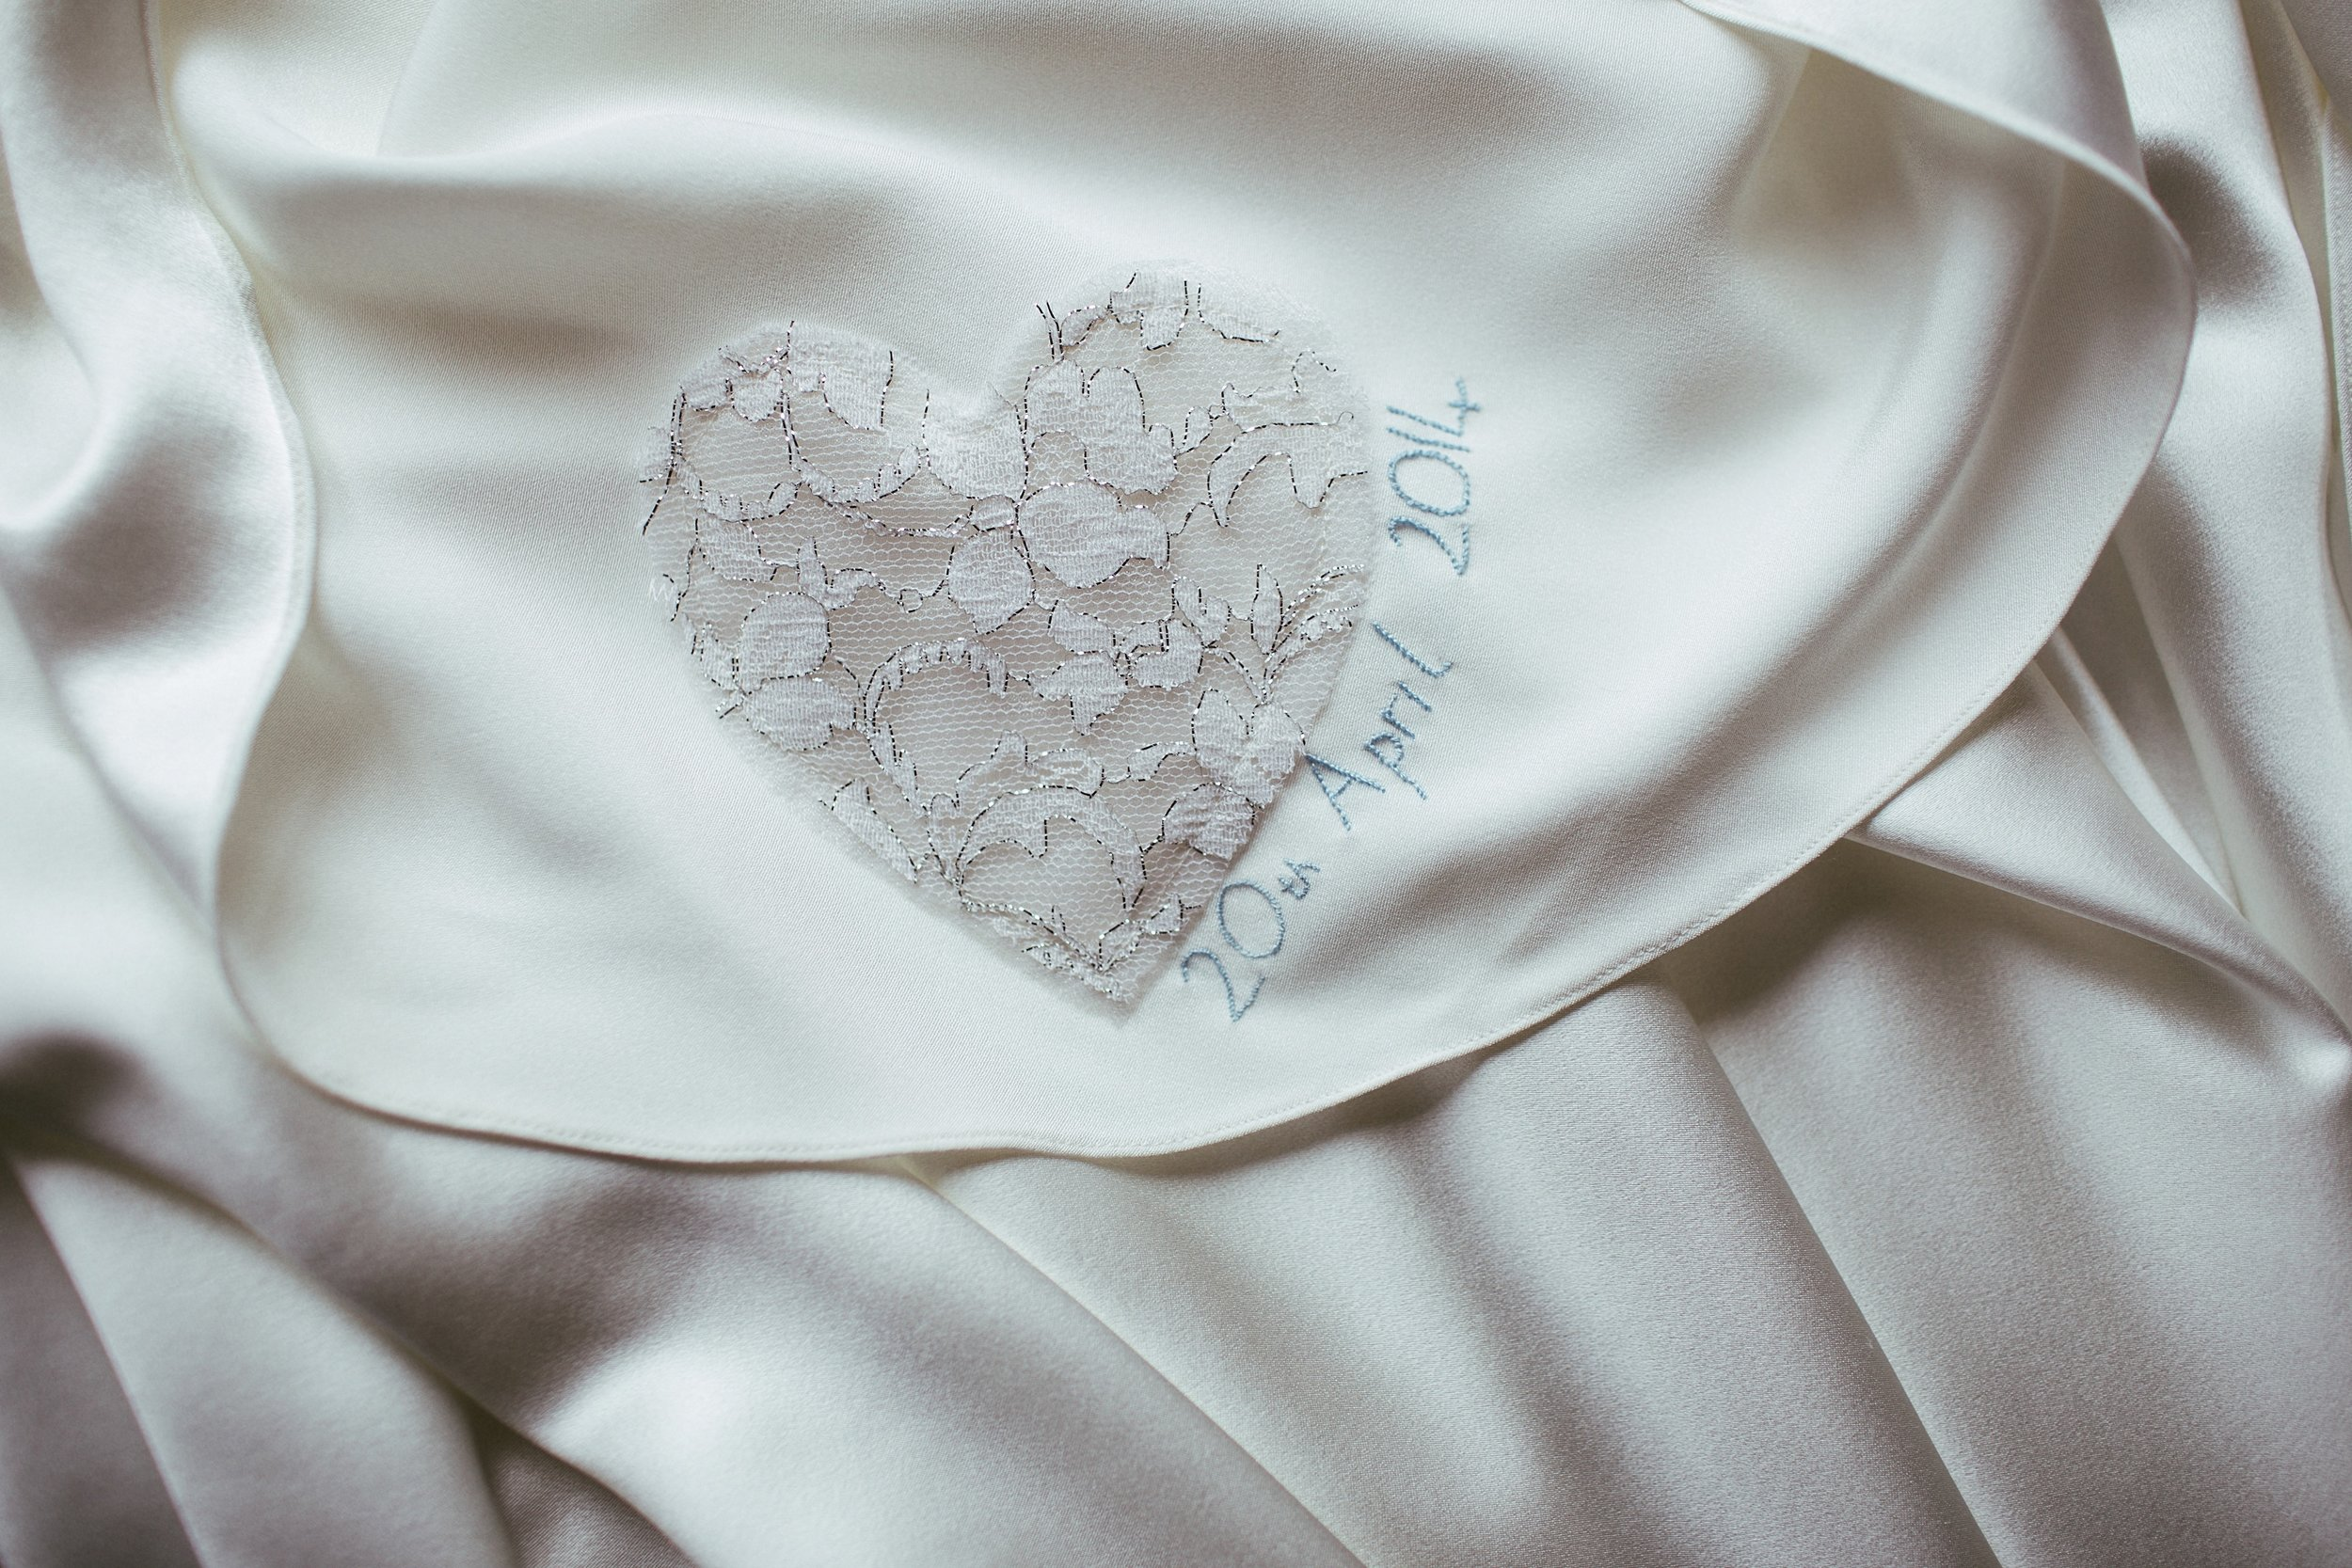 Samantha-Yorkshire-Sheffield-Bespoke-Vintage-Lace-Tulle-Bride-Wedding-Dress-Susanna-Greening-Derbyshire-13